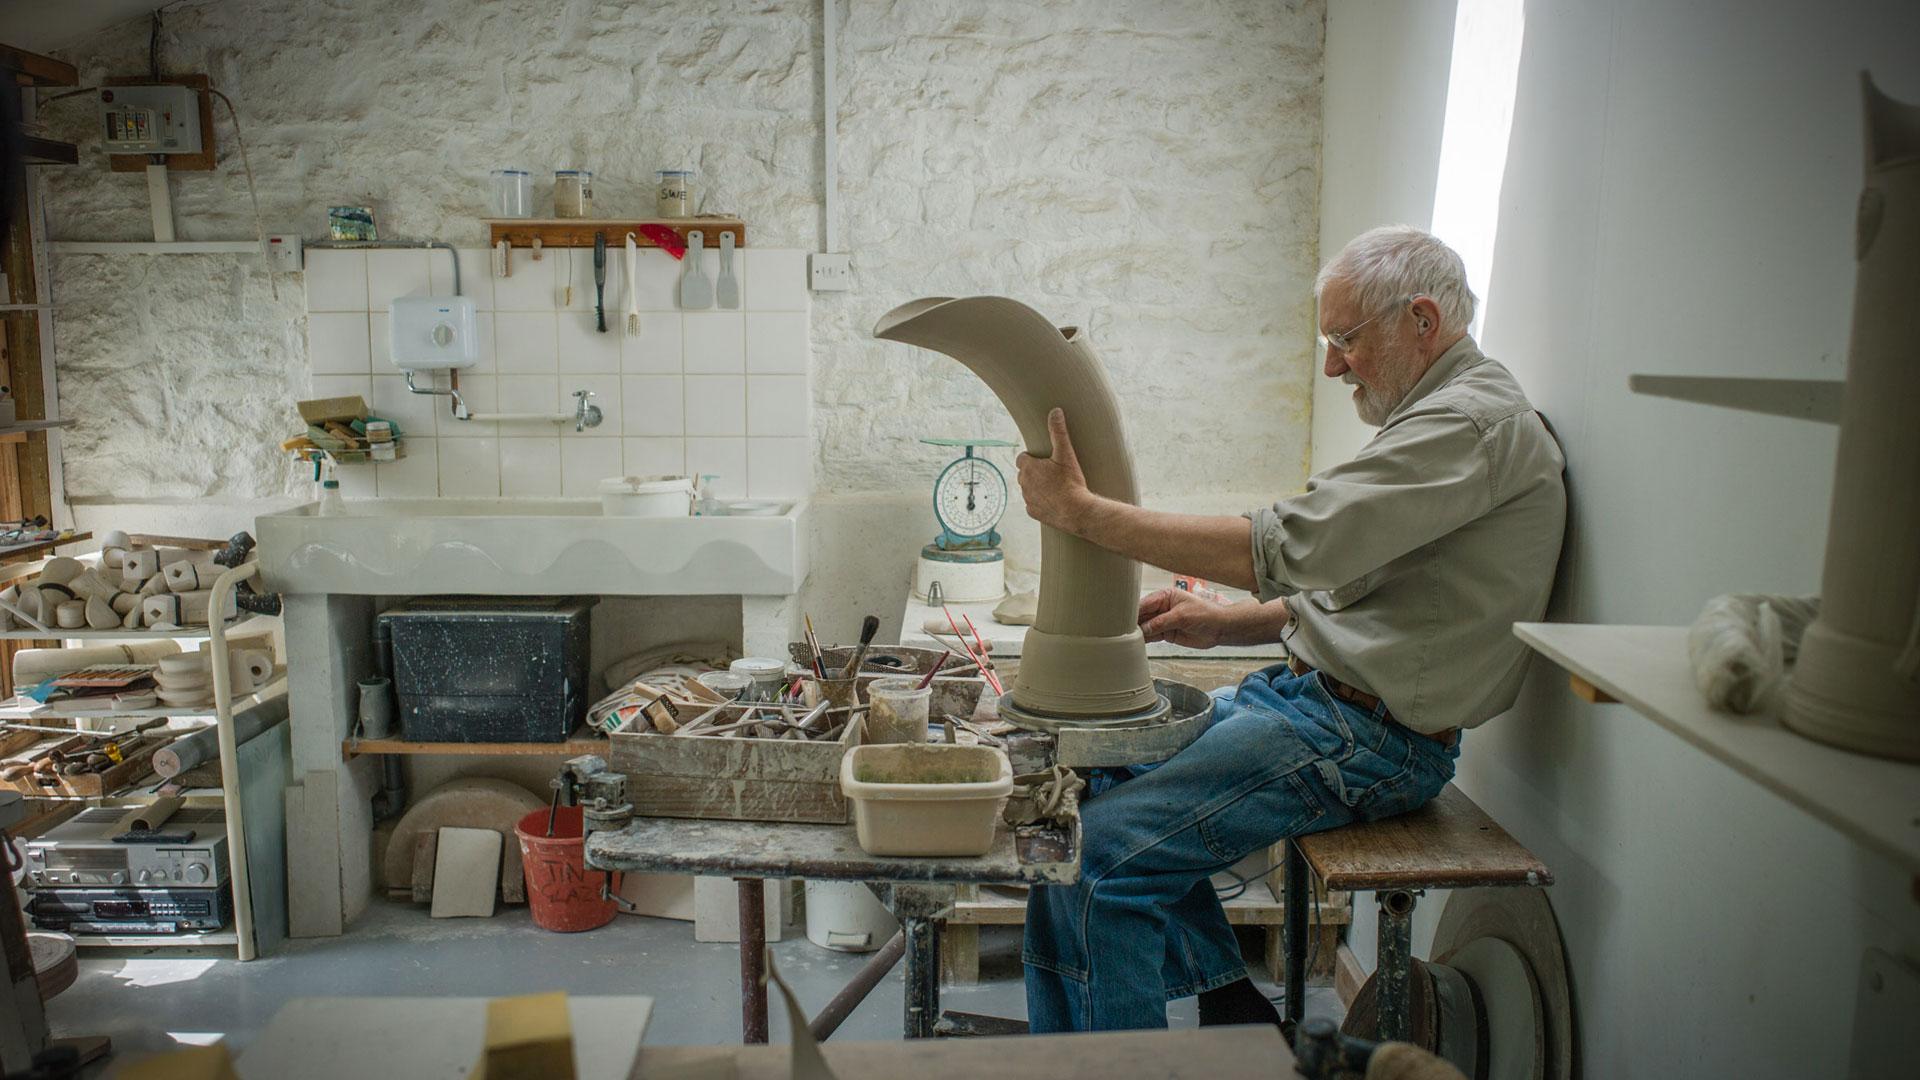 Walter Keeler: Treasures of the Everyday - Documentary film about UK potter   GOLDMARK